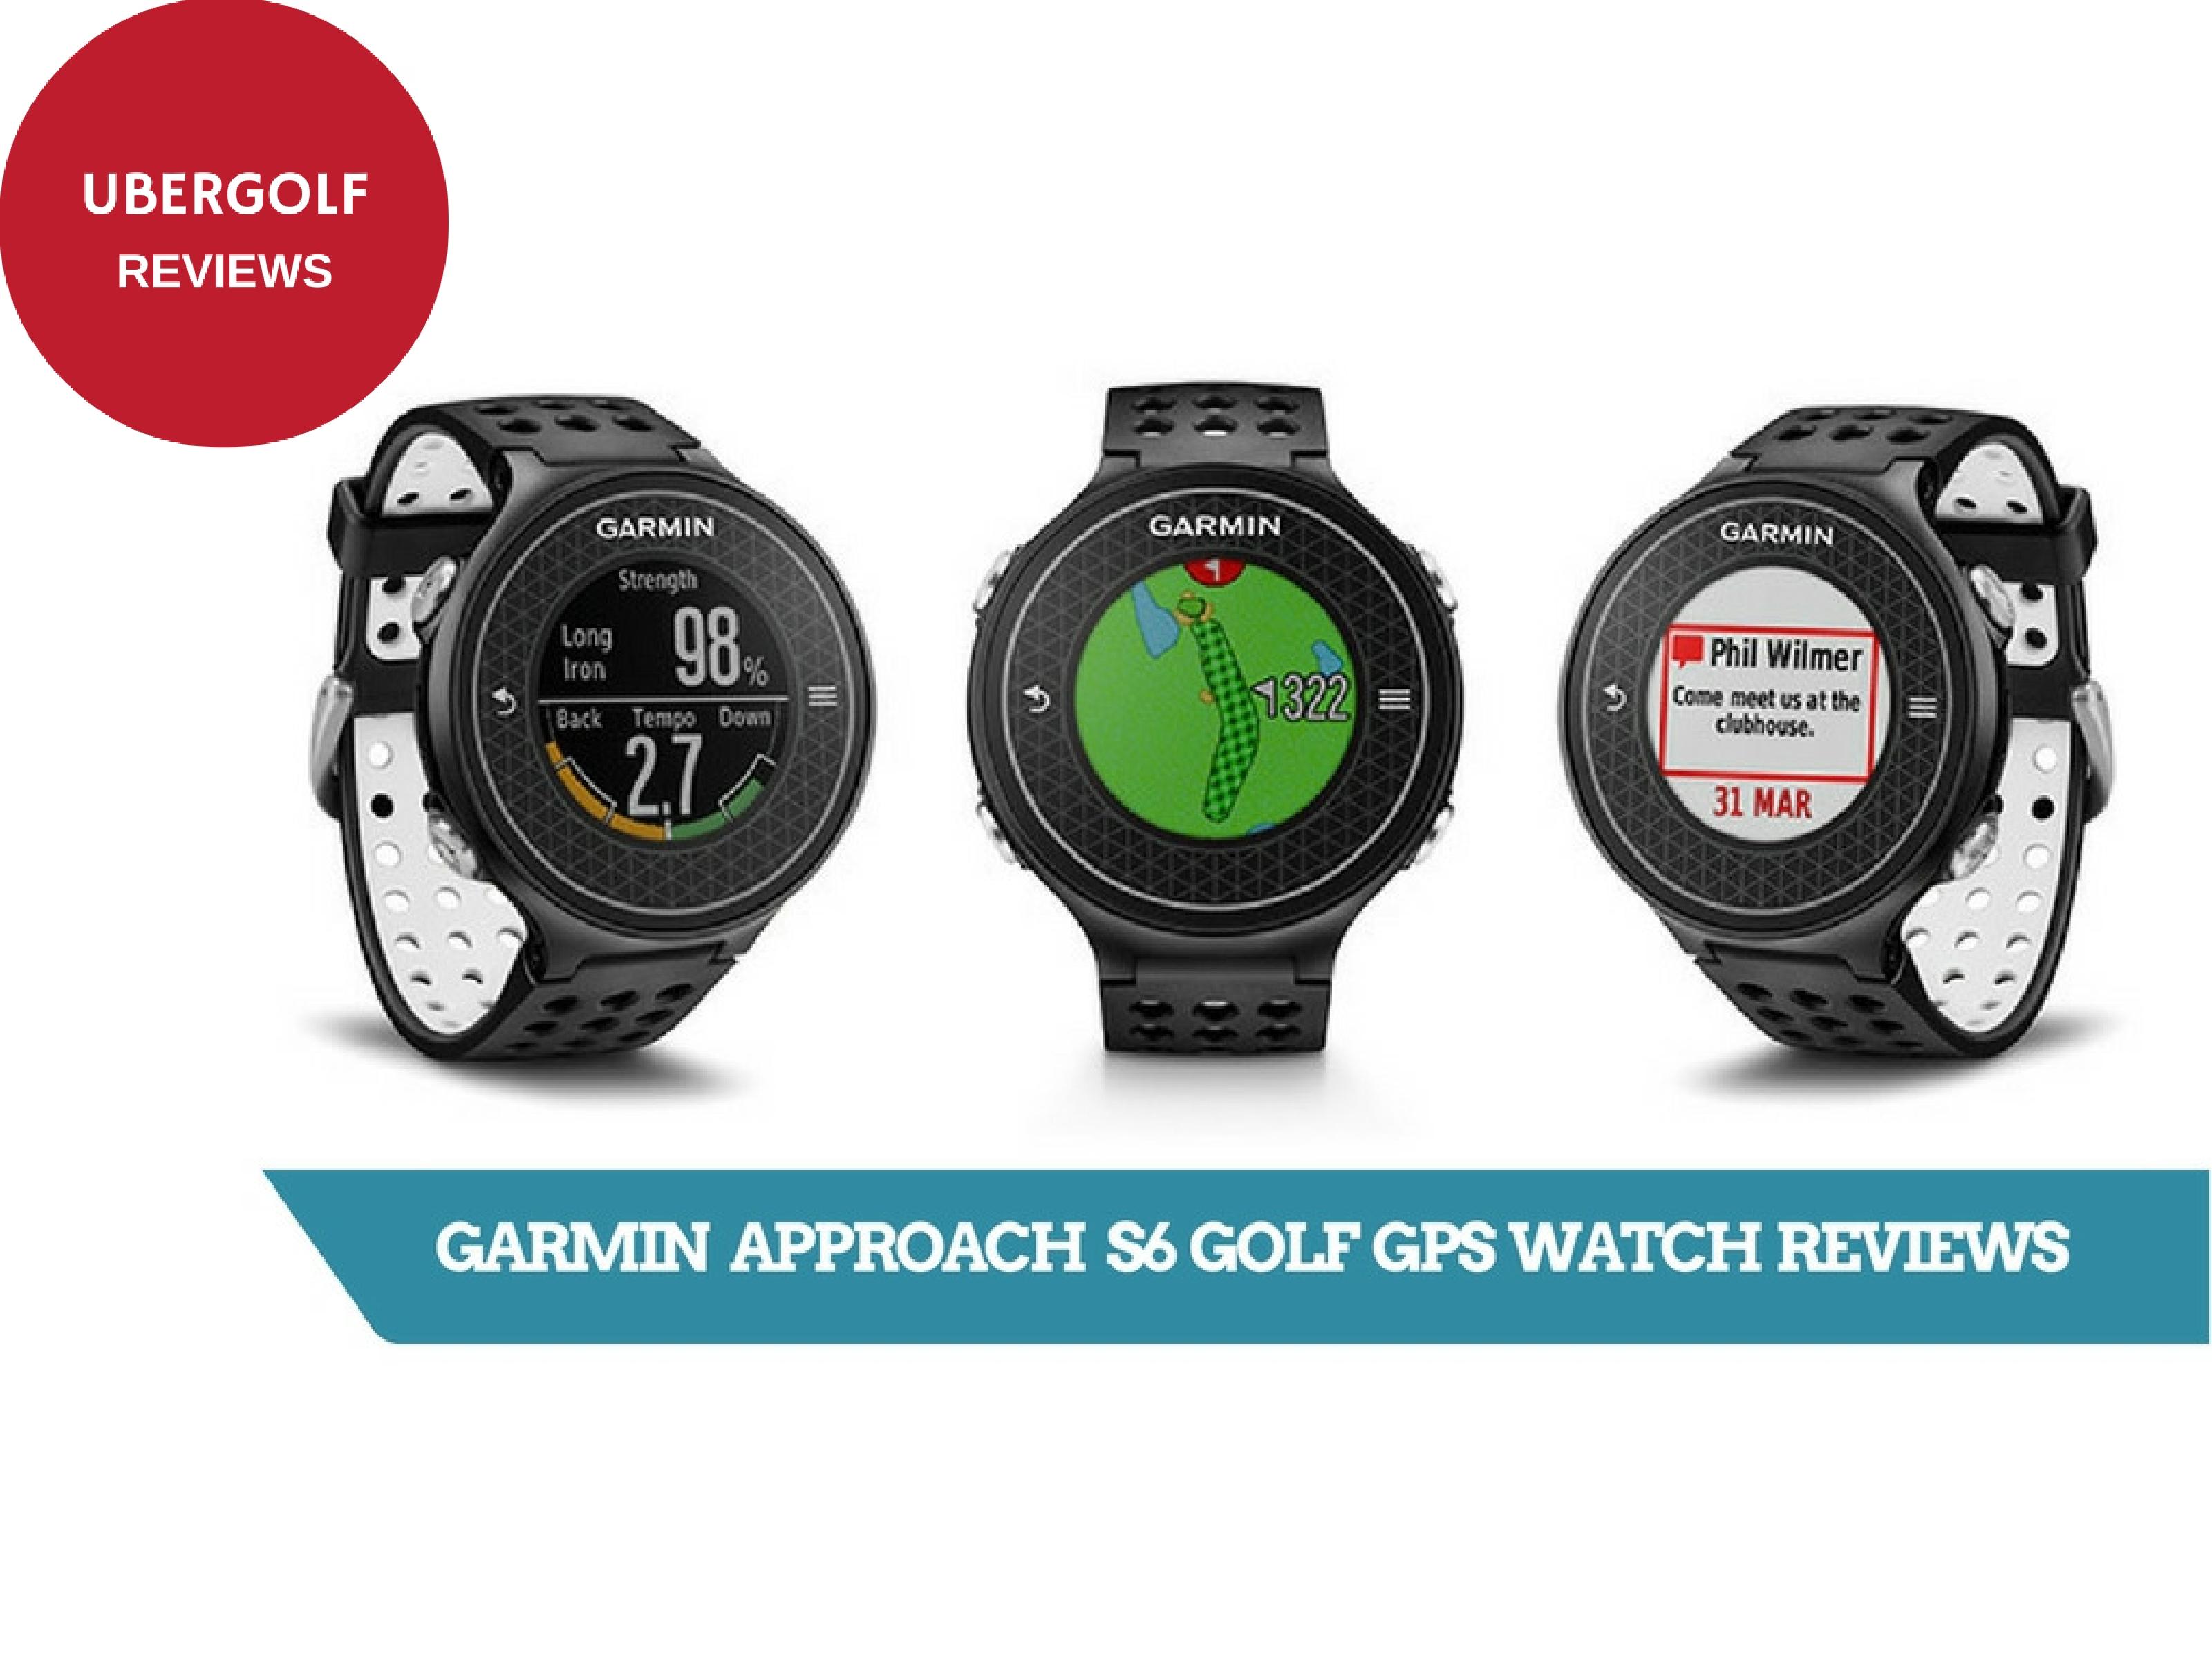 garmin approach s6 golf gps watch reviews ubergolf. Black Bedroom Furniture Sets. Home Design Ideas